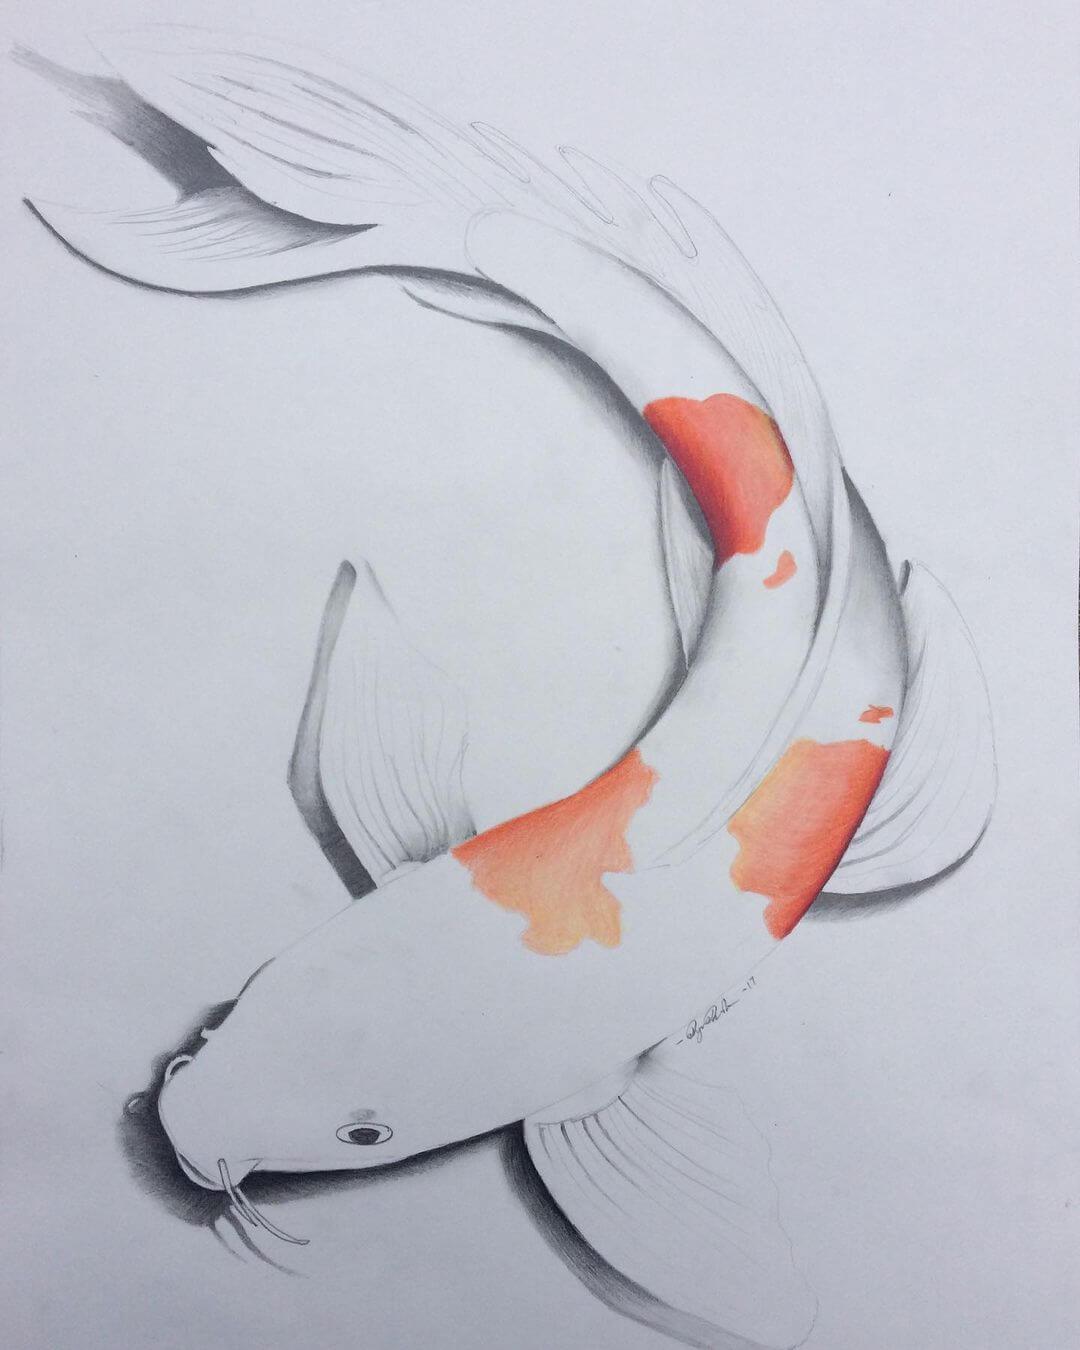 koi fish sketch